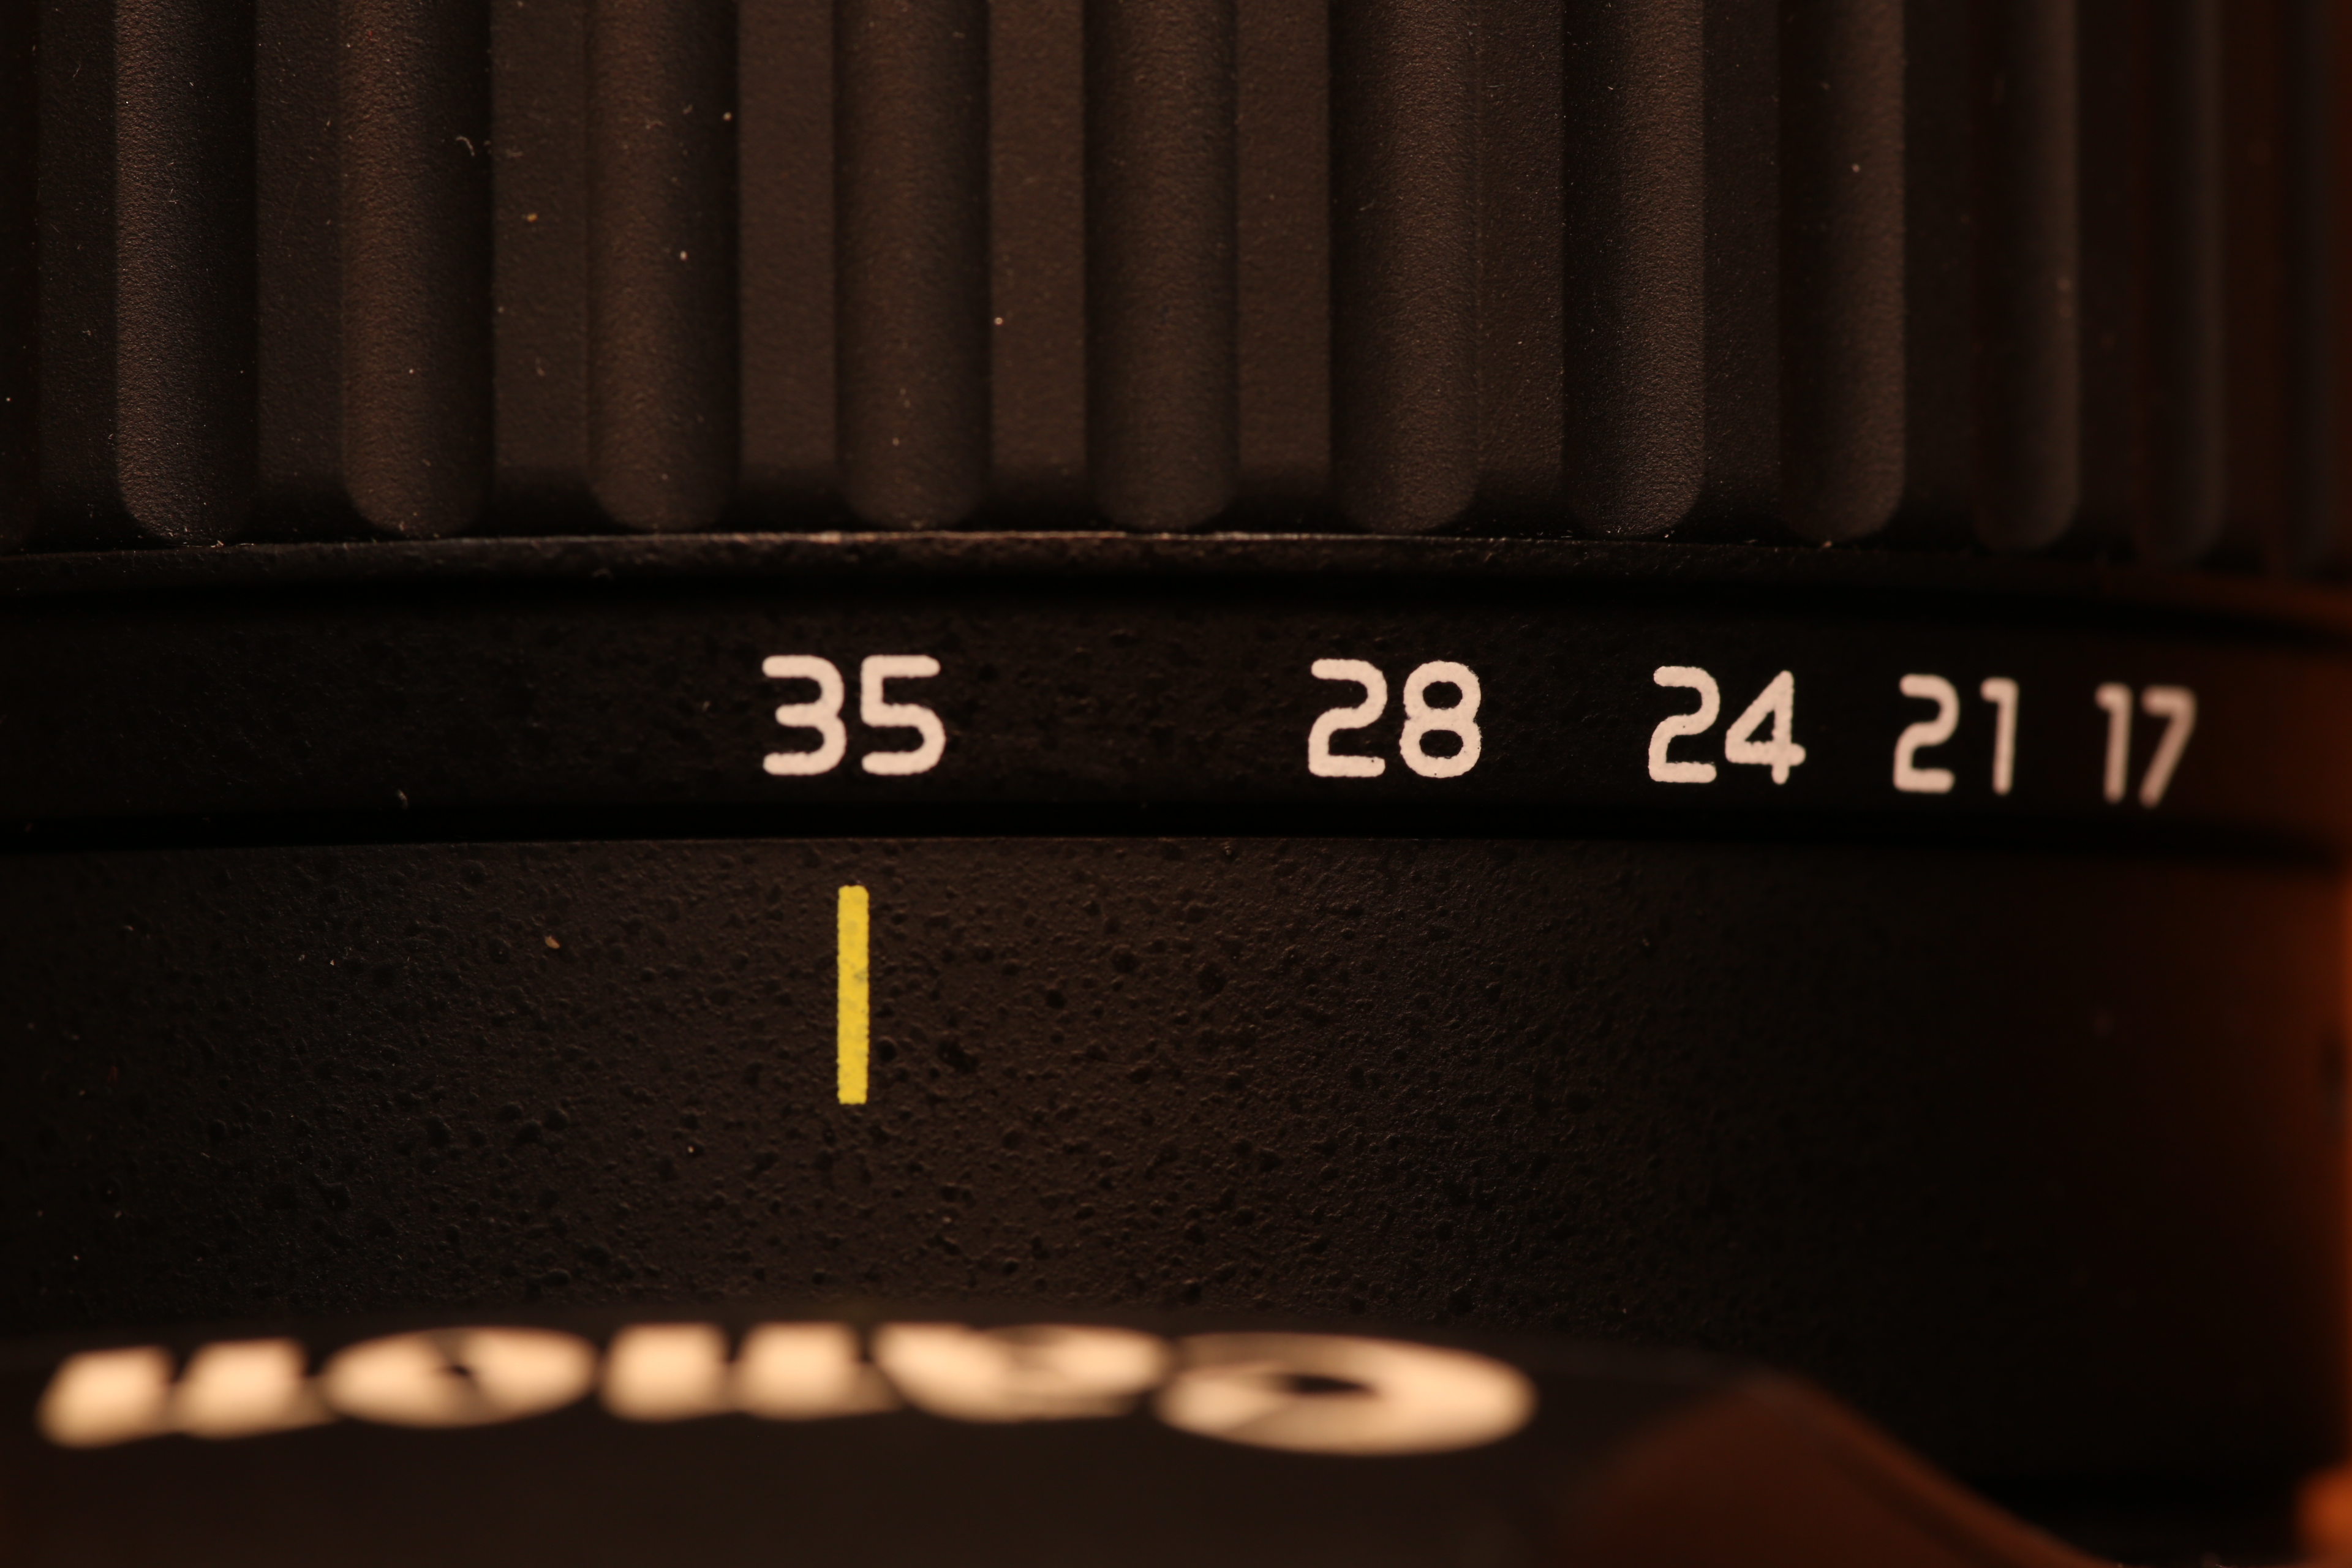 Объектив Tokina Canon AF 10-17 mm F/3.5-4.5 AT-X DX Fisheye